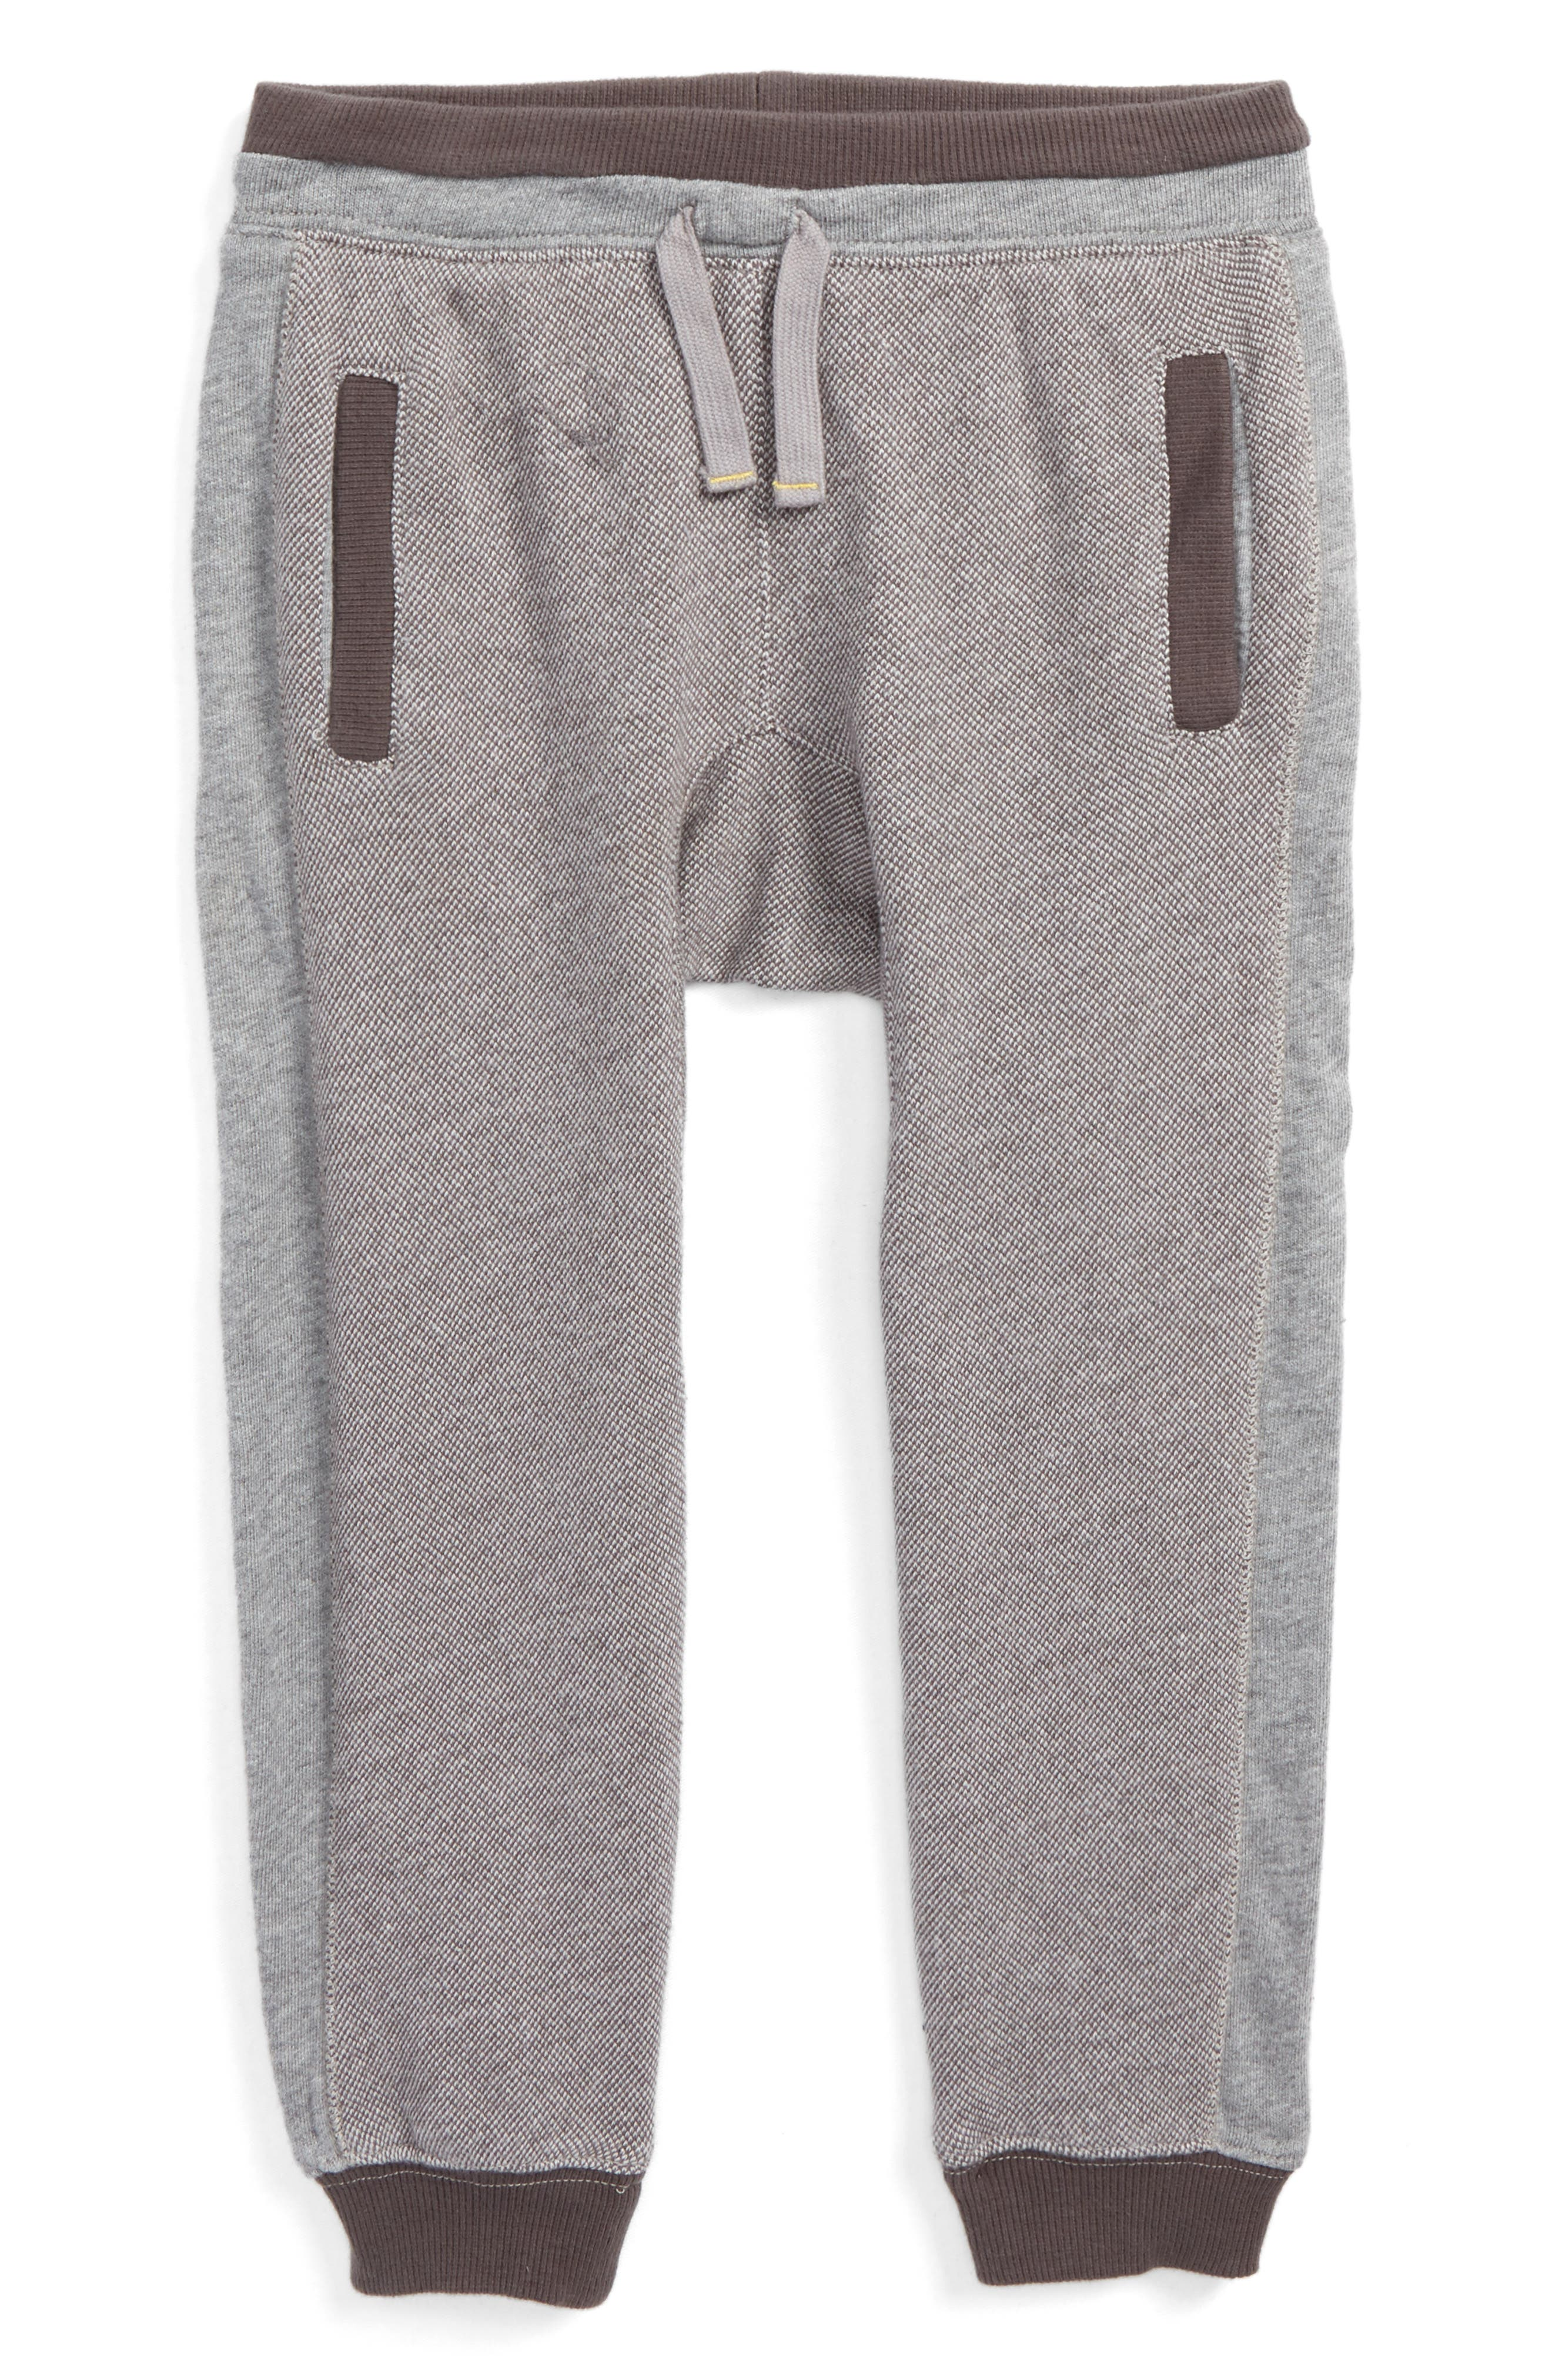 Splendid Birdseye Knit Jogger Pants (Toddler Boys & Little Boys)